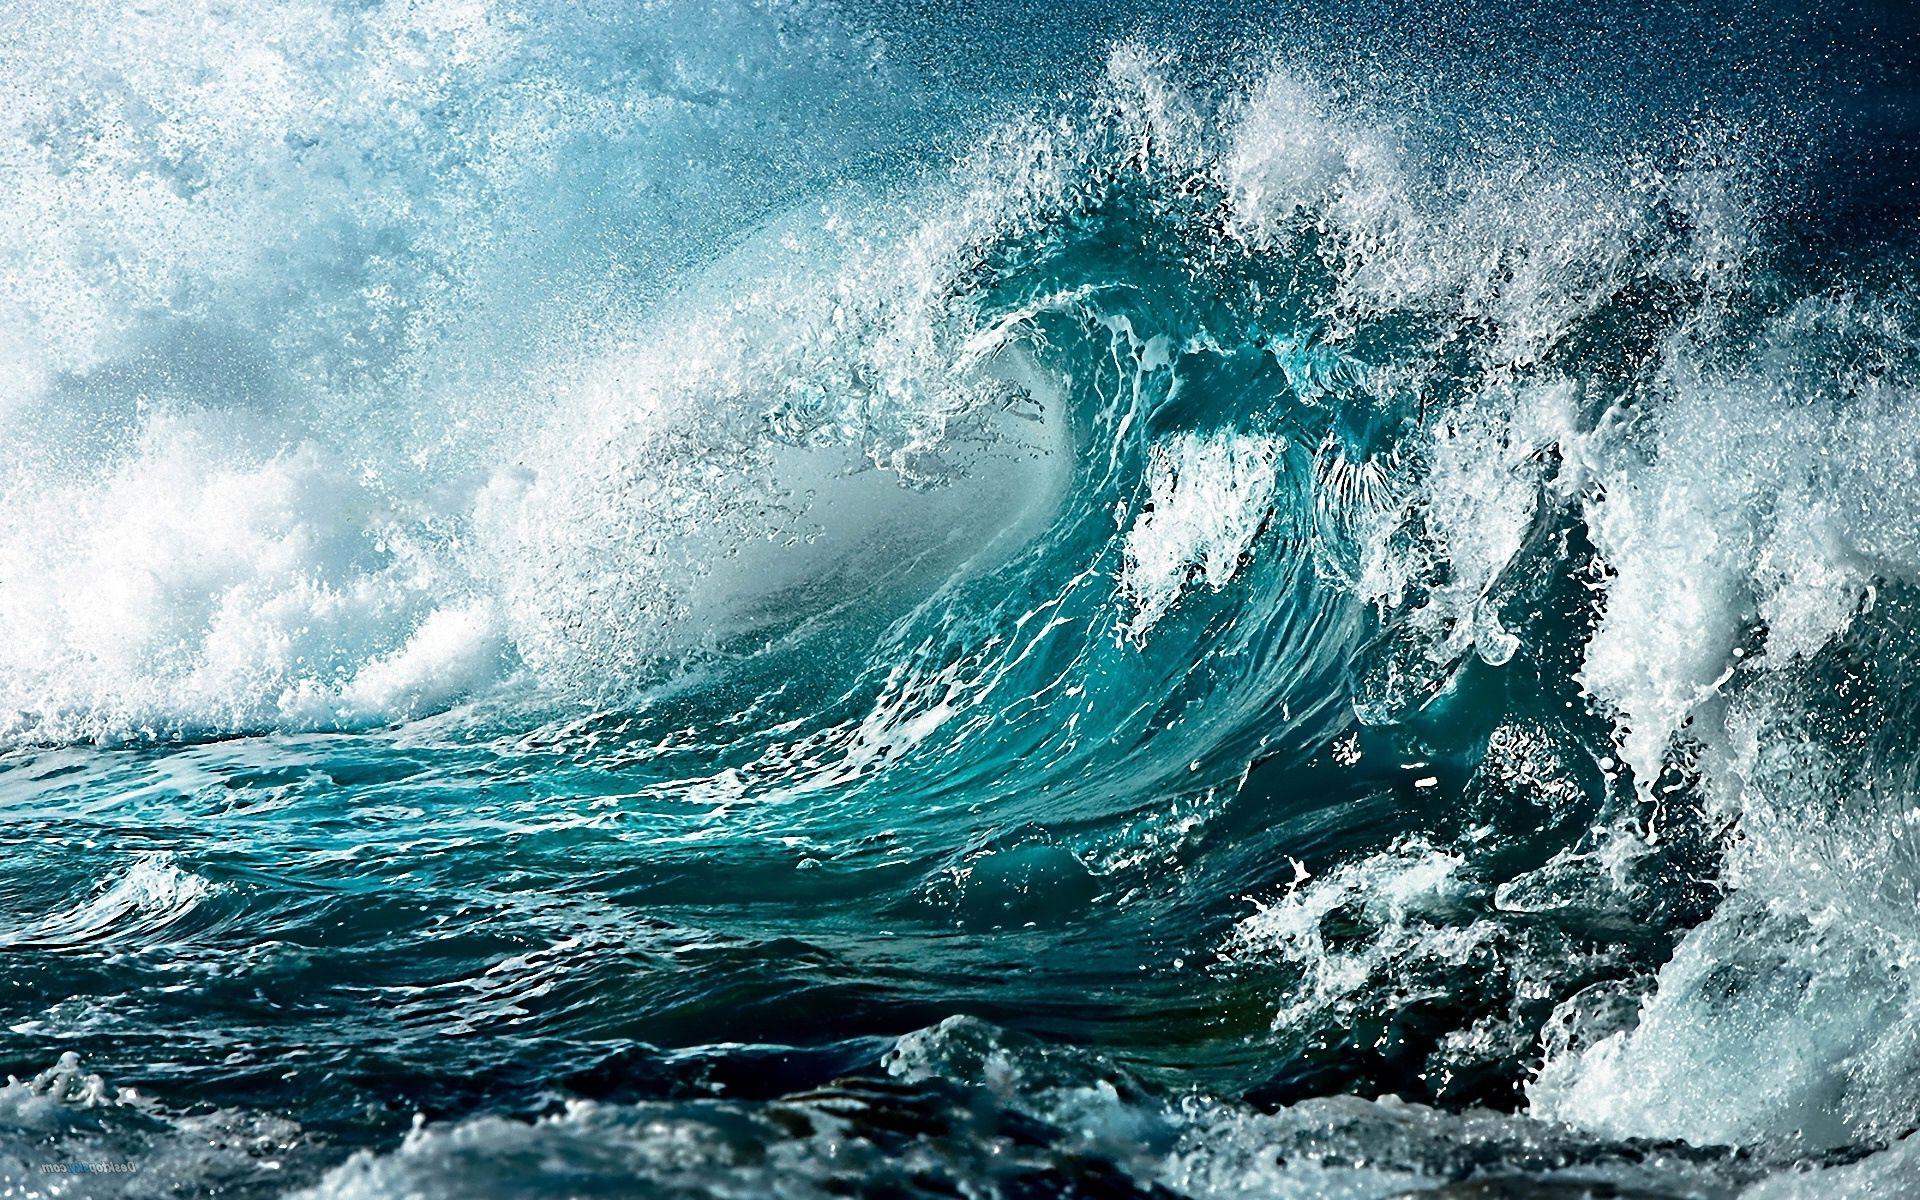 Wave Wallpaper High Resolution Big blue waves ...